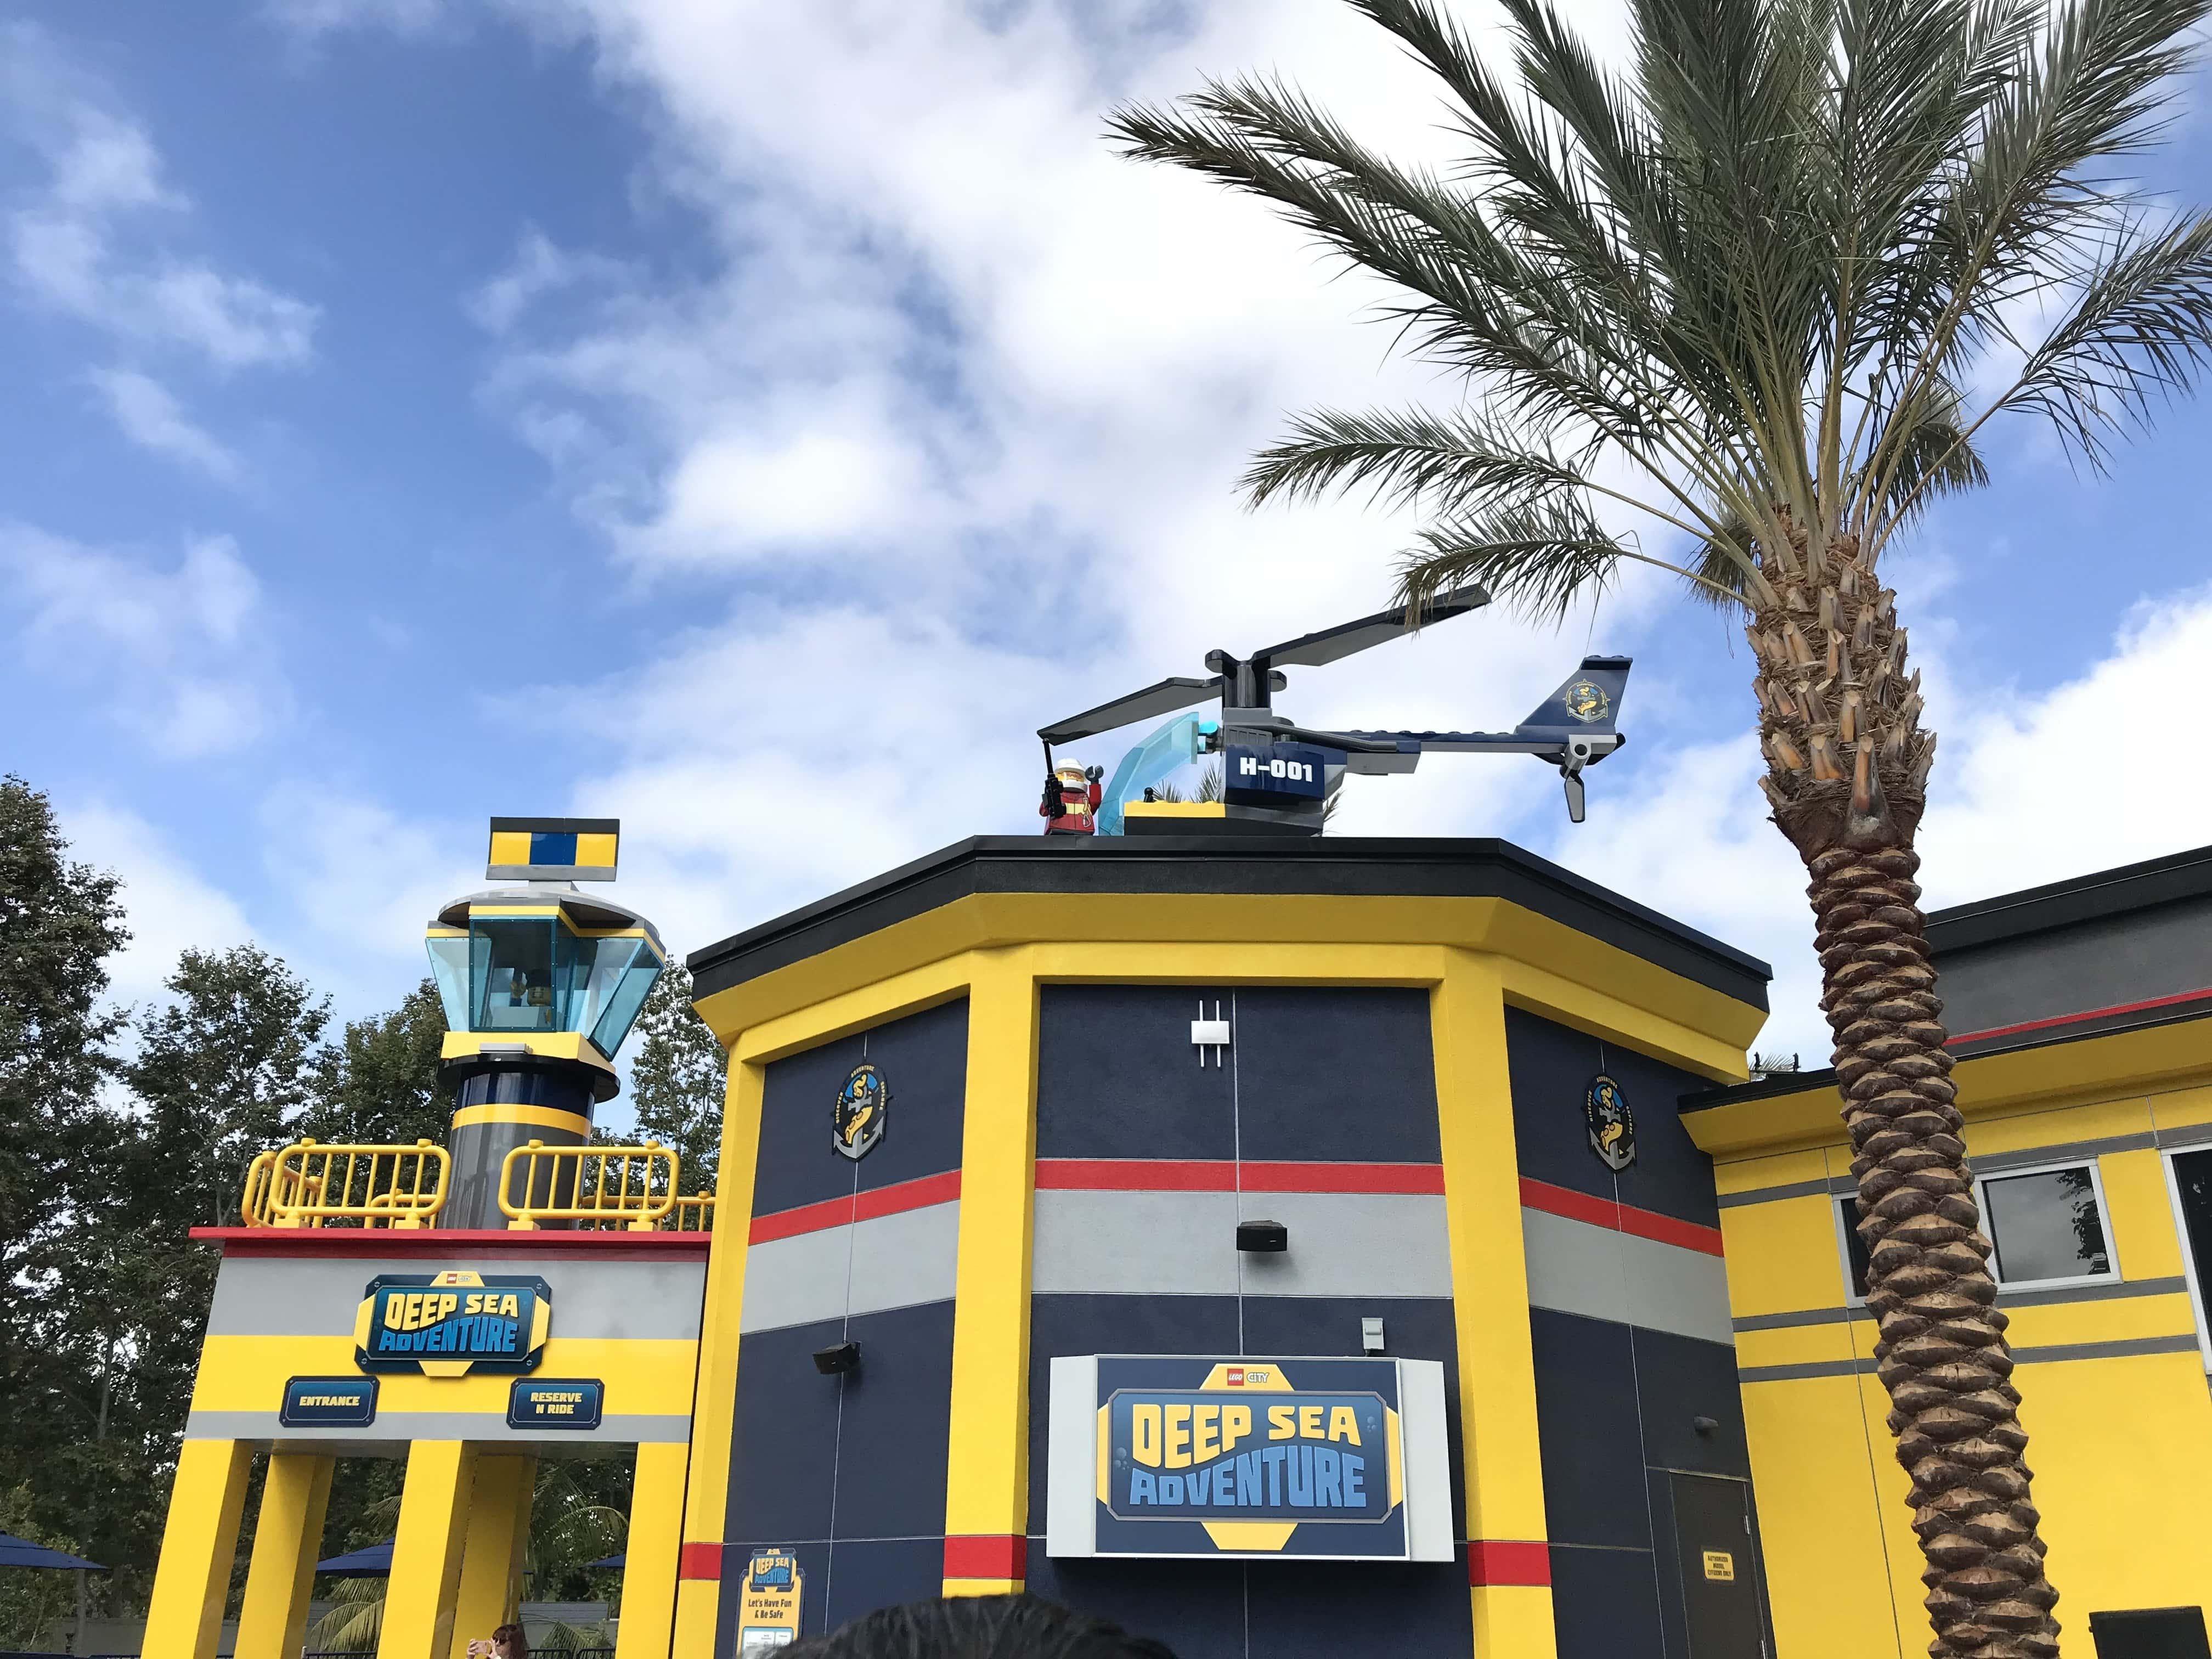 Legoland California Lego City: Deep Sea Adventure Submarine Ride